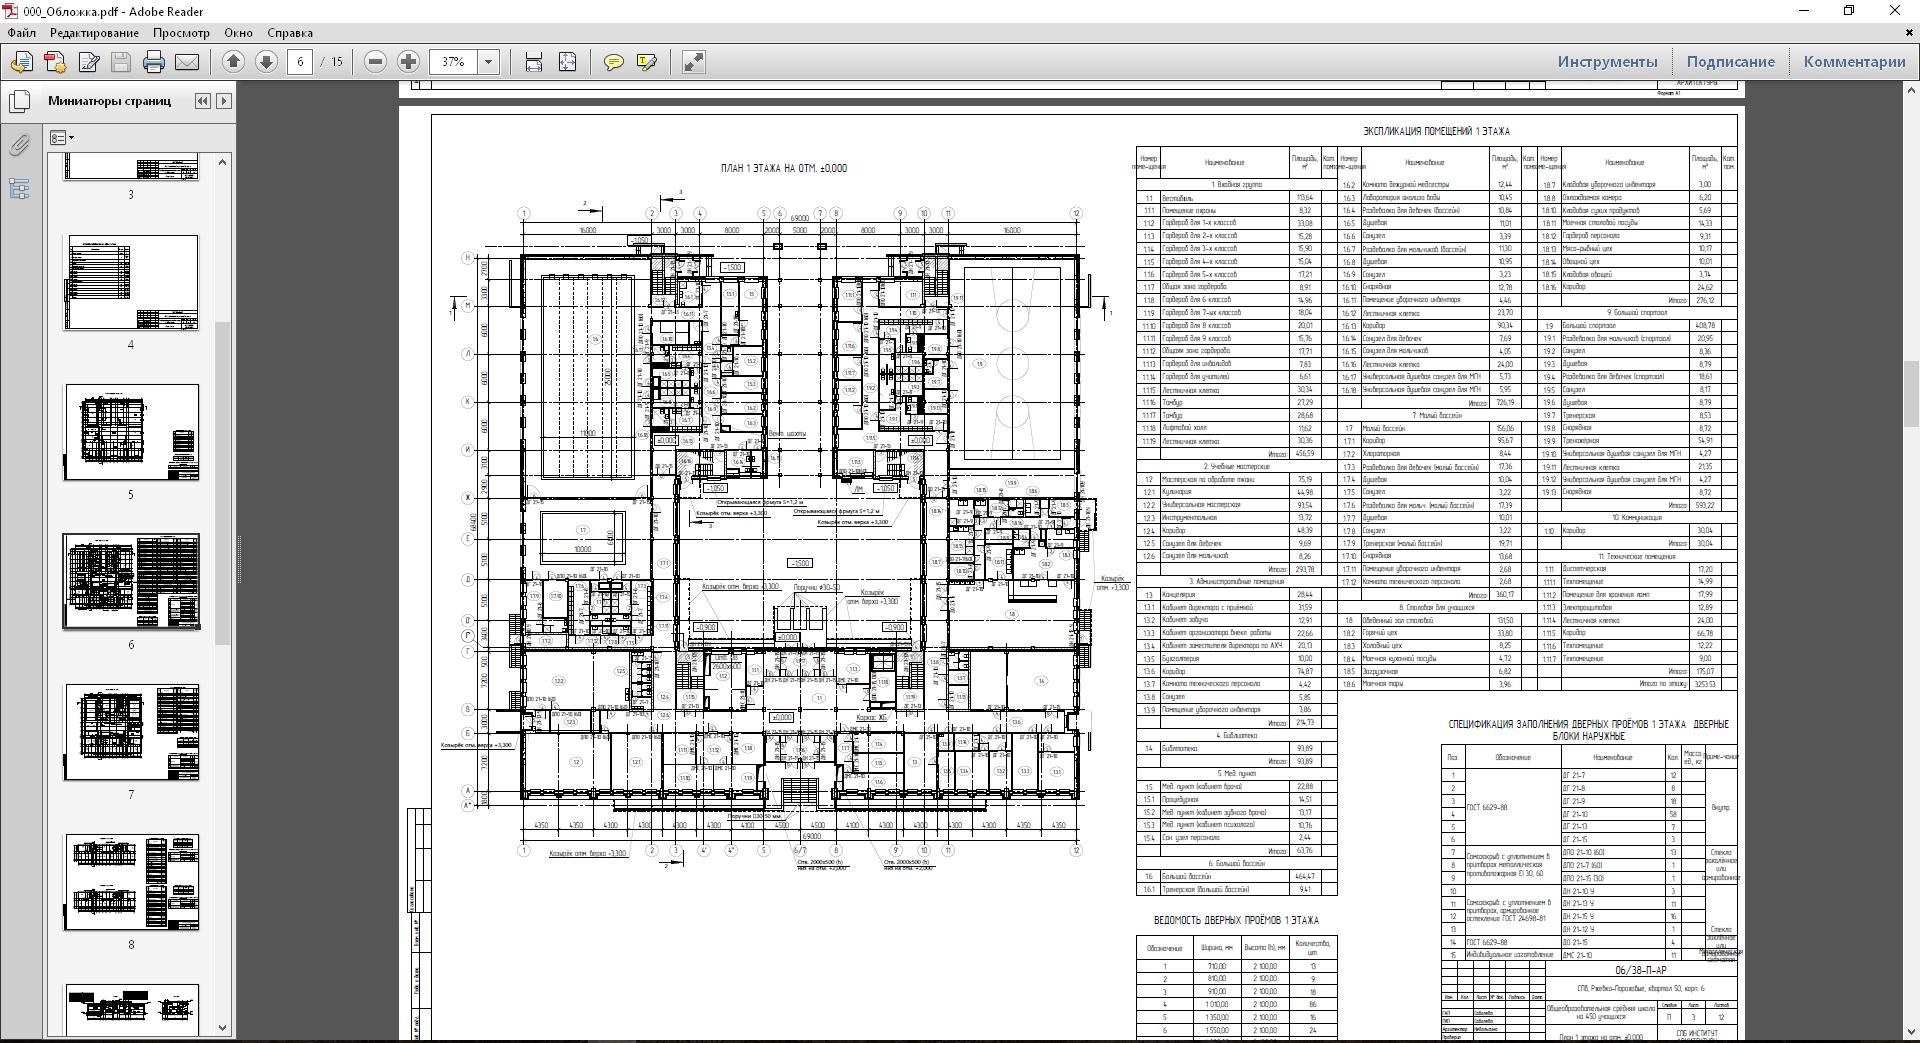 Проектная документация в PDF-формат